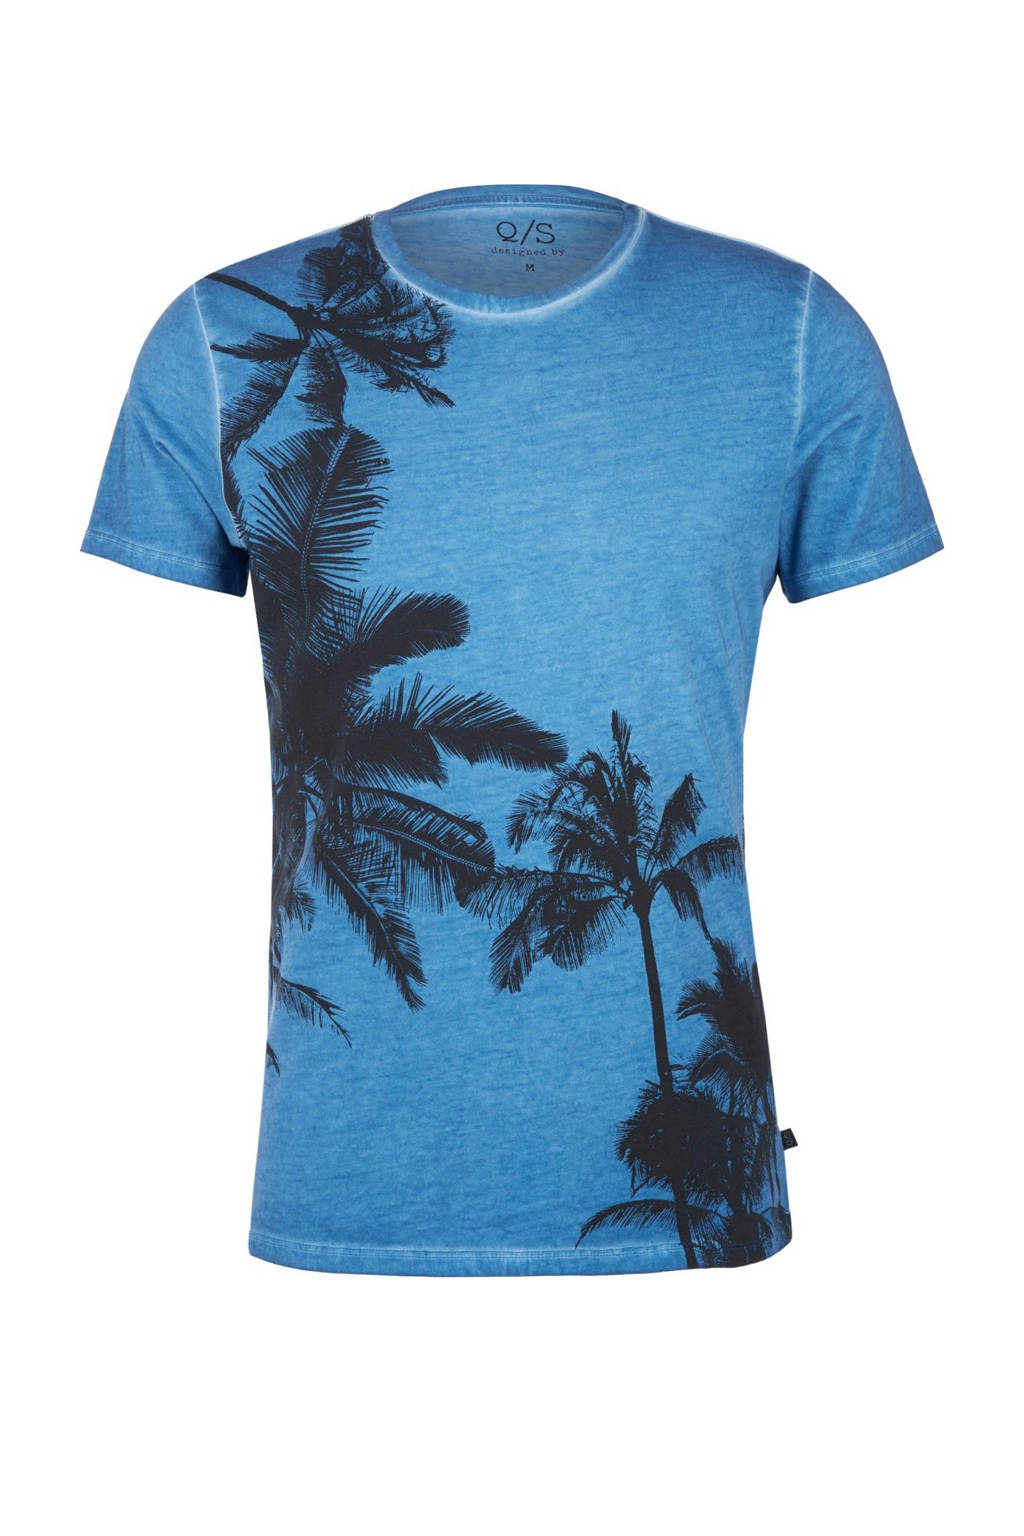 Q/S designed by T-shirt met printopdruk blauw, Blauw